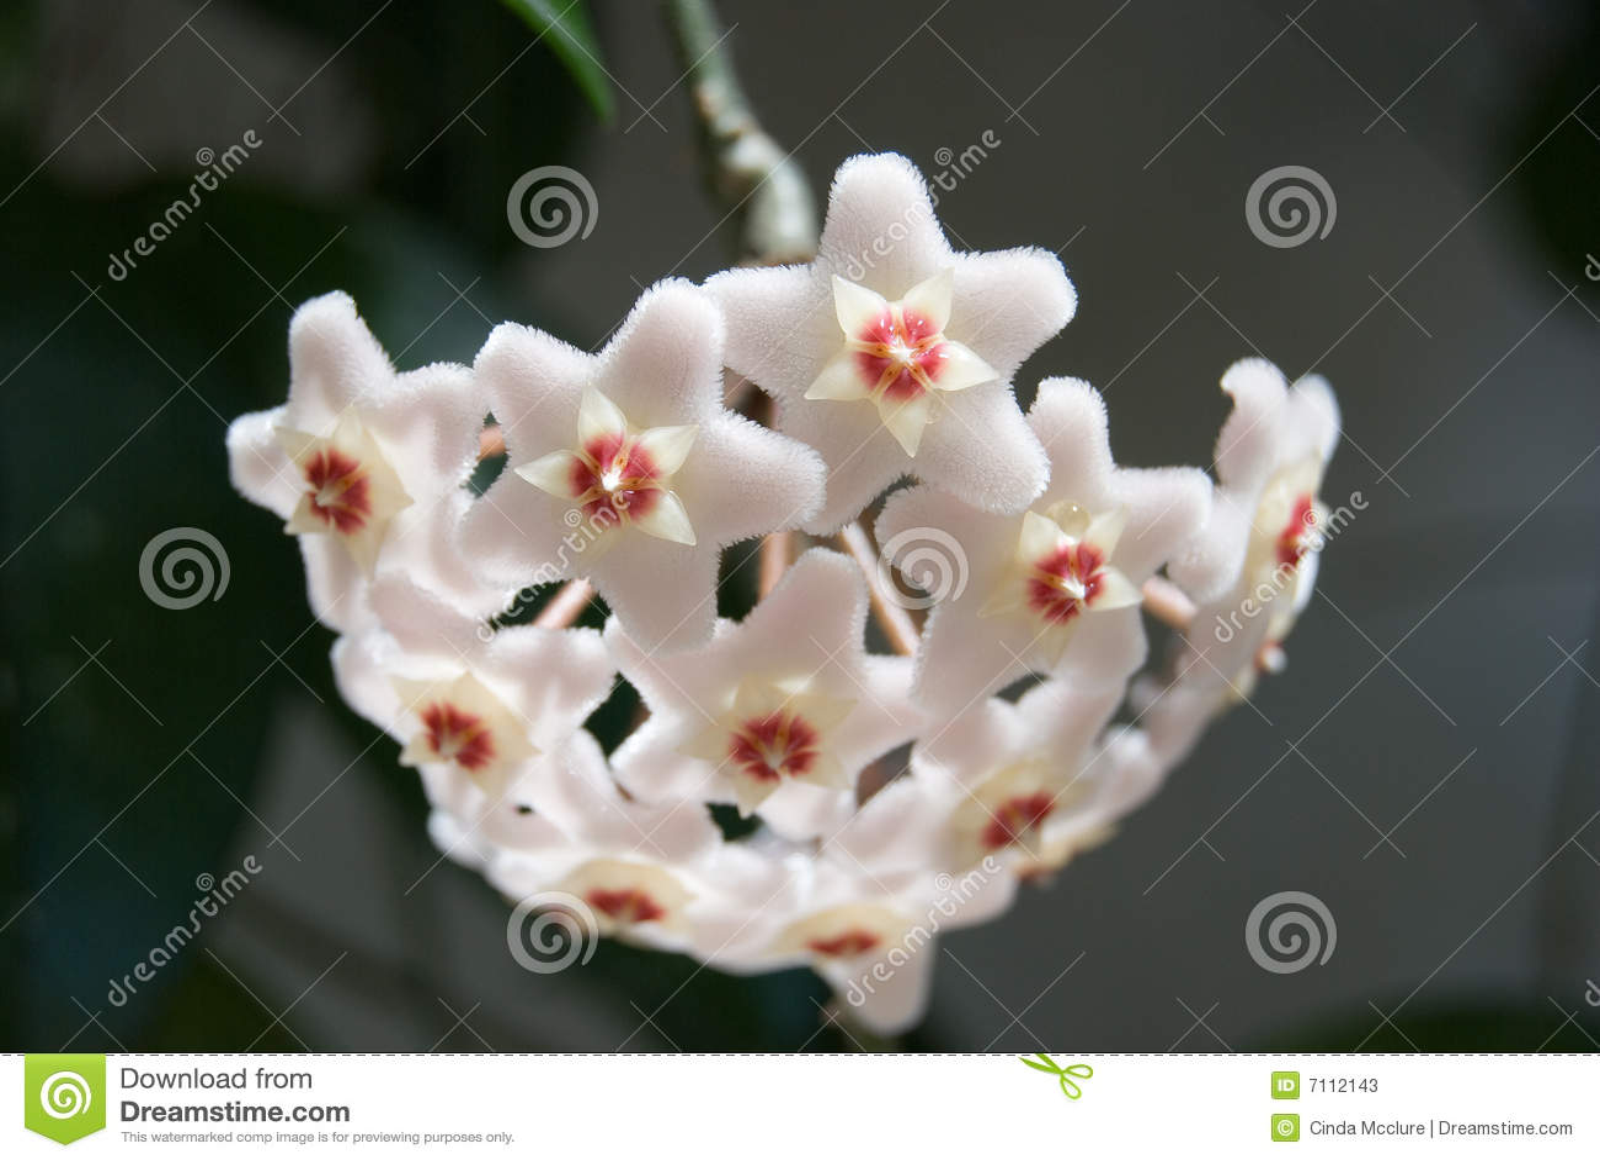 Hoya (Hoya carnosa) flower cluster